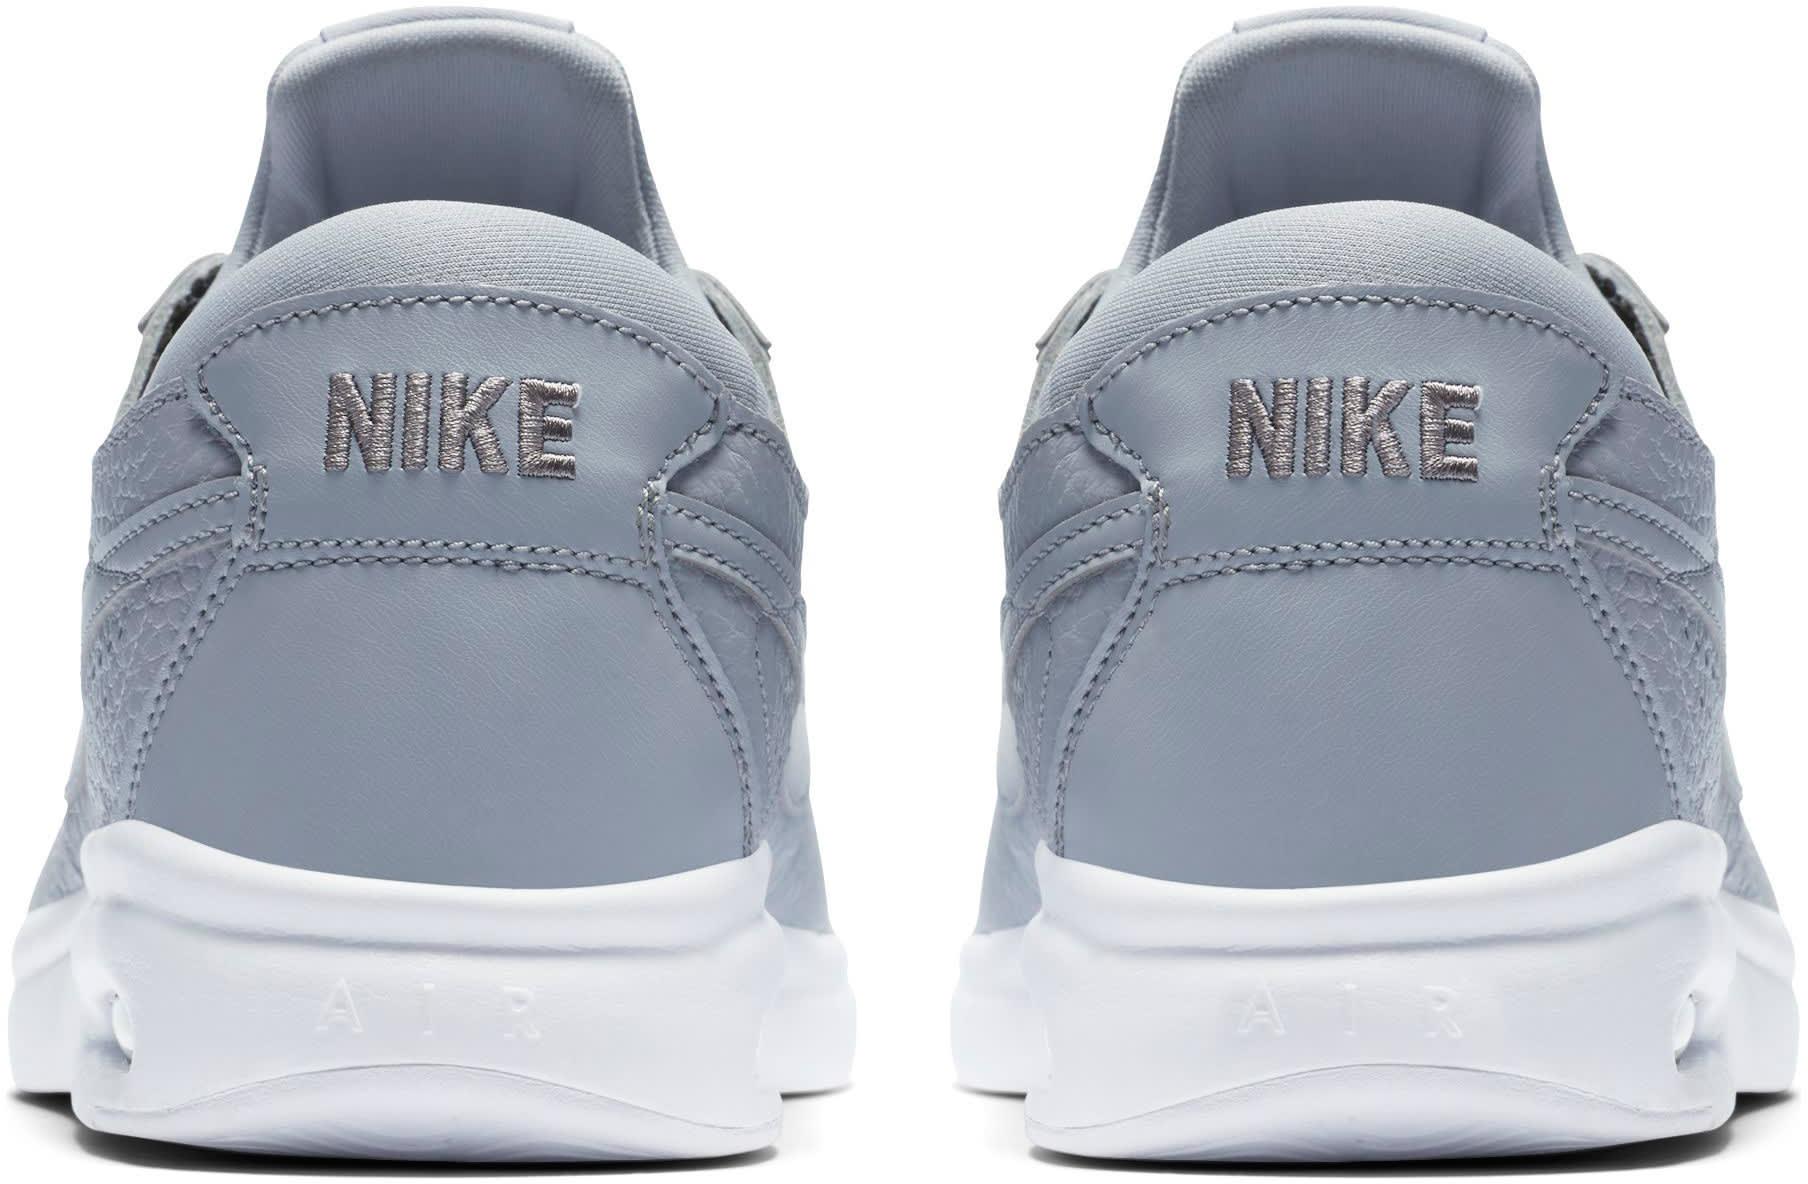 0674697473c Nike SB Air Max Bruin Vapor Leather Skate Shoes - thumbnail 4